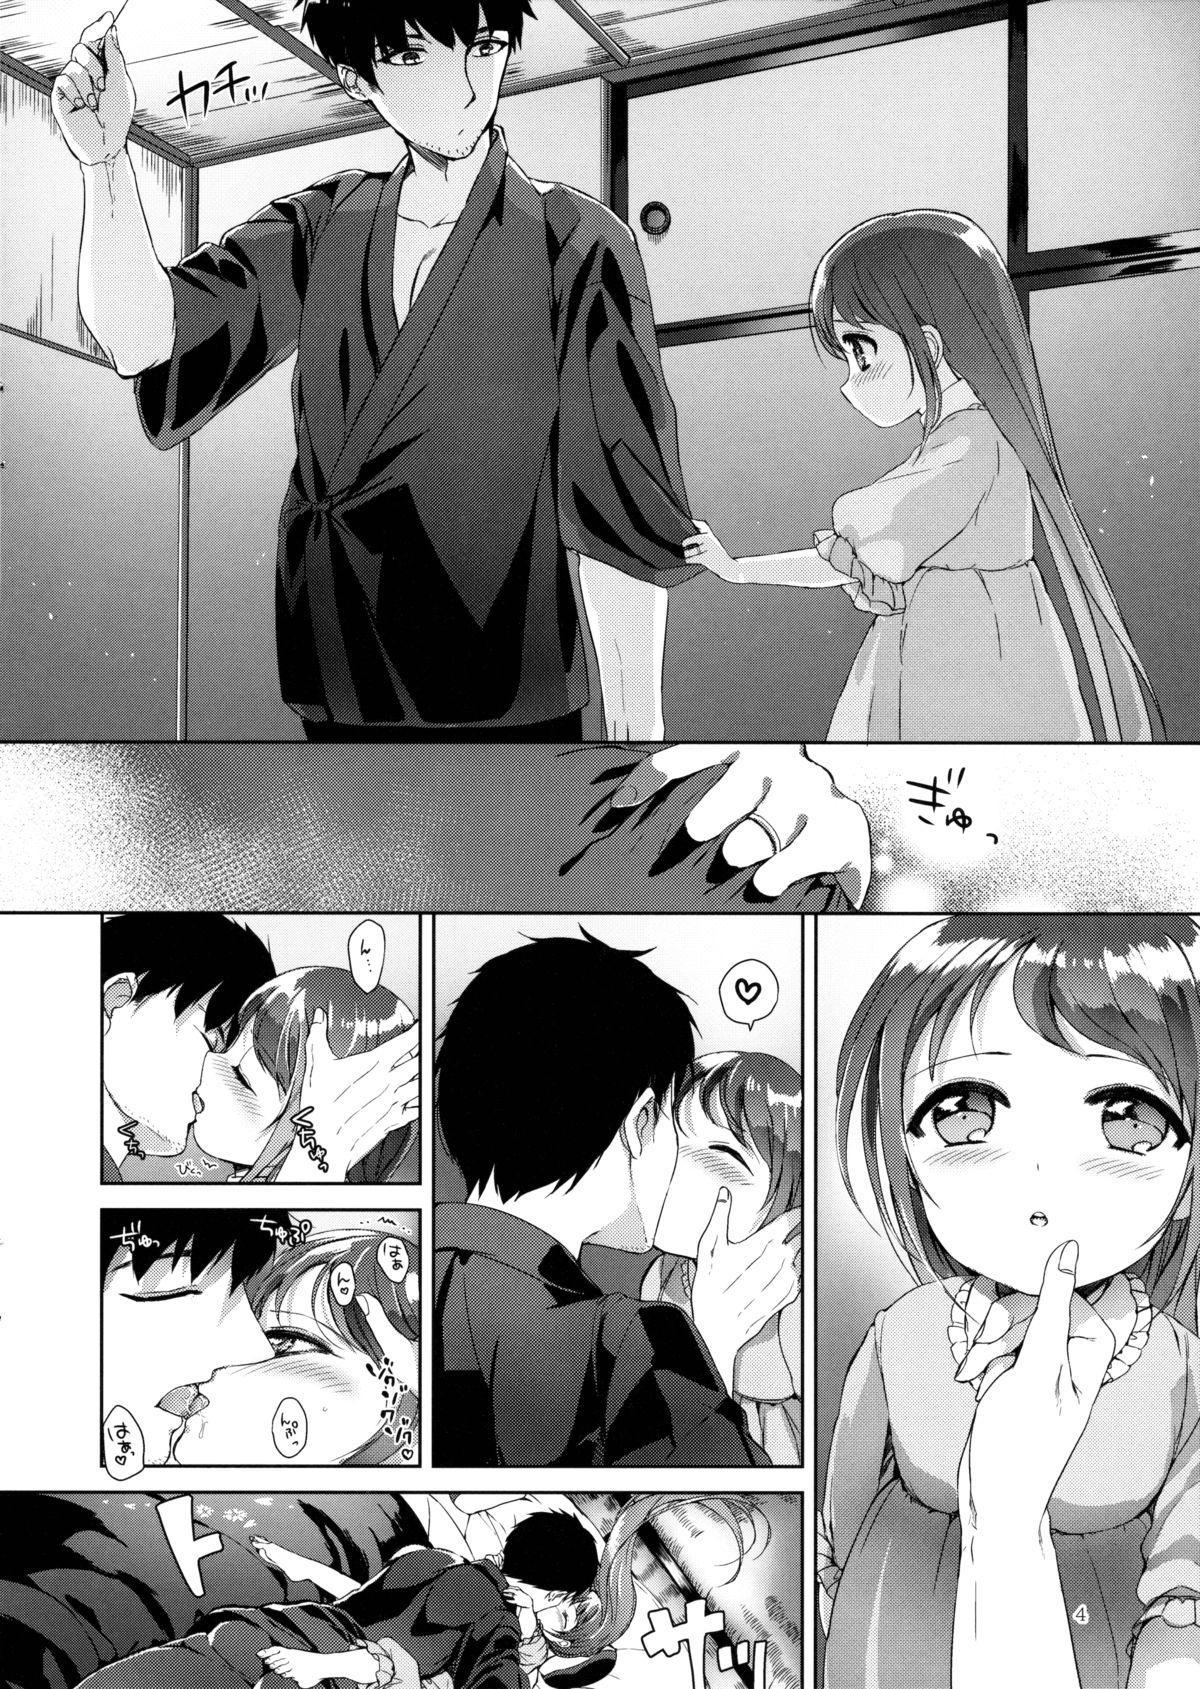 Ohayou kara Oyasumi made Samidare-chan 3